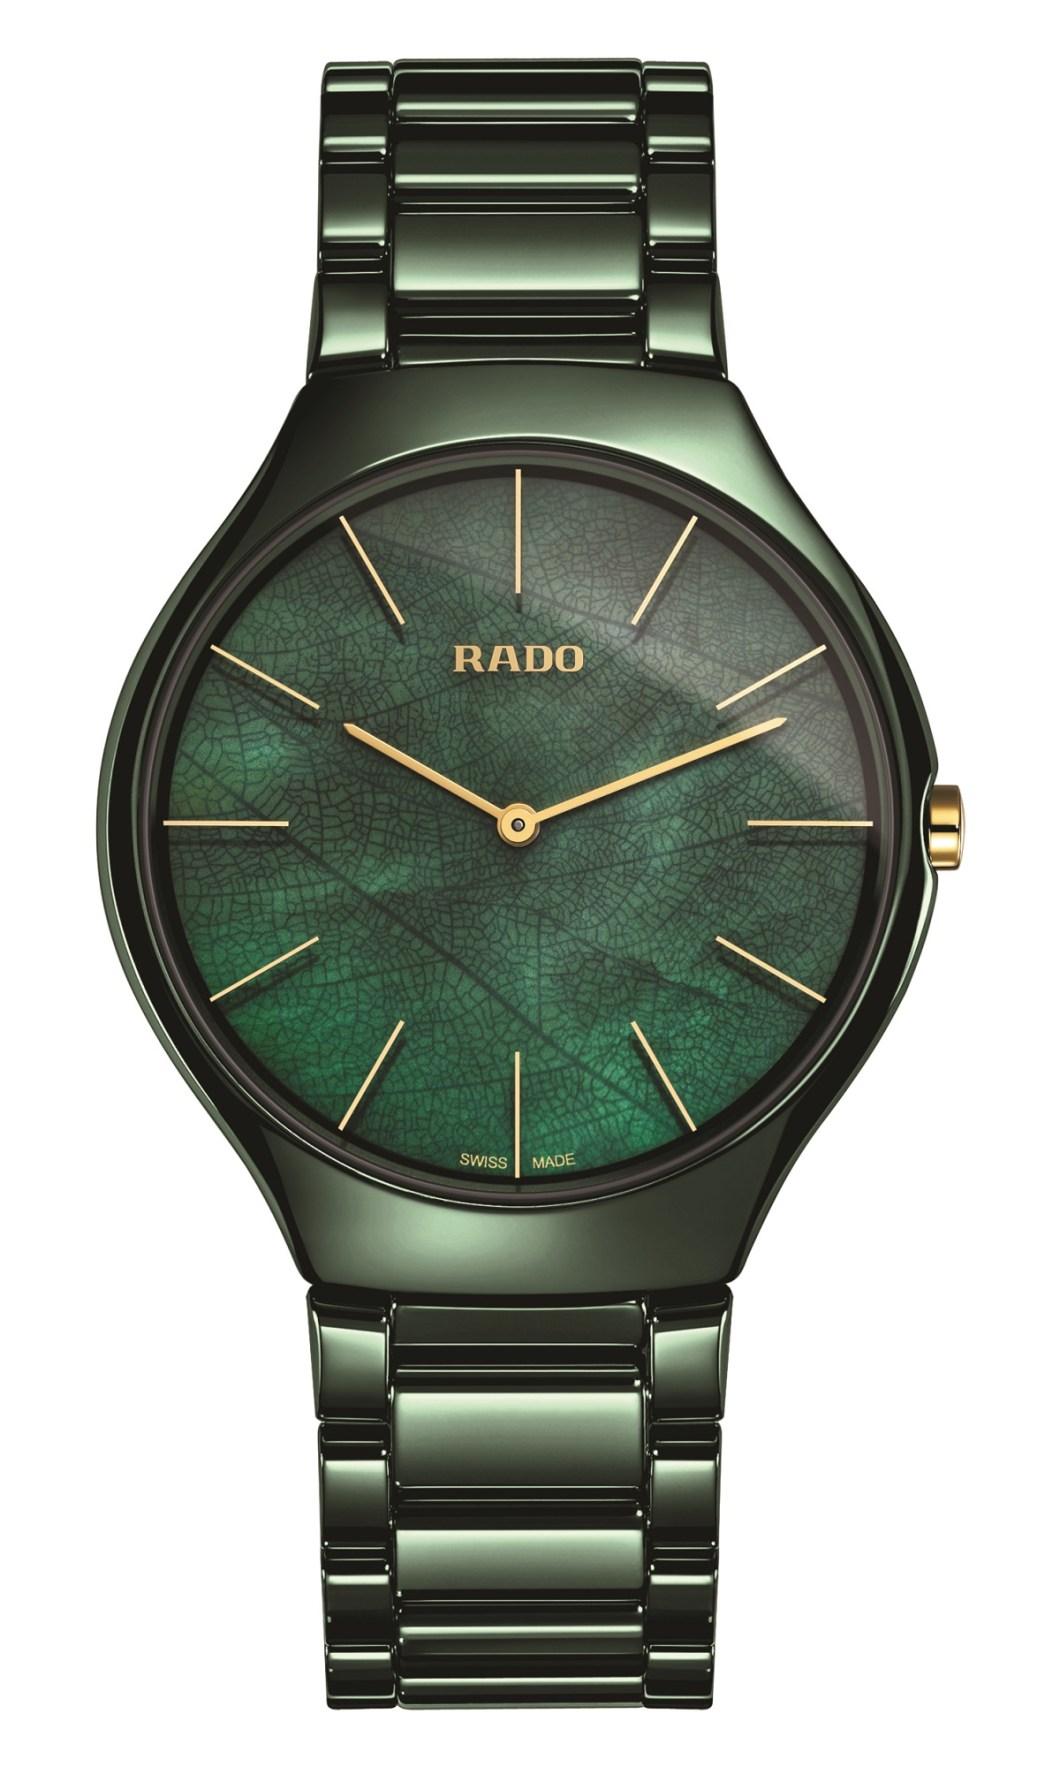 Rado True Thinline Quartz 'Nature' Watch Releases